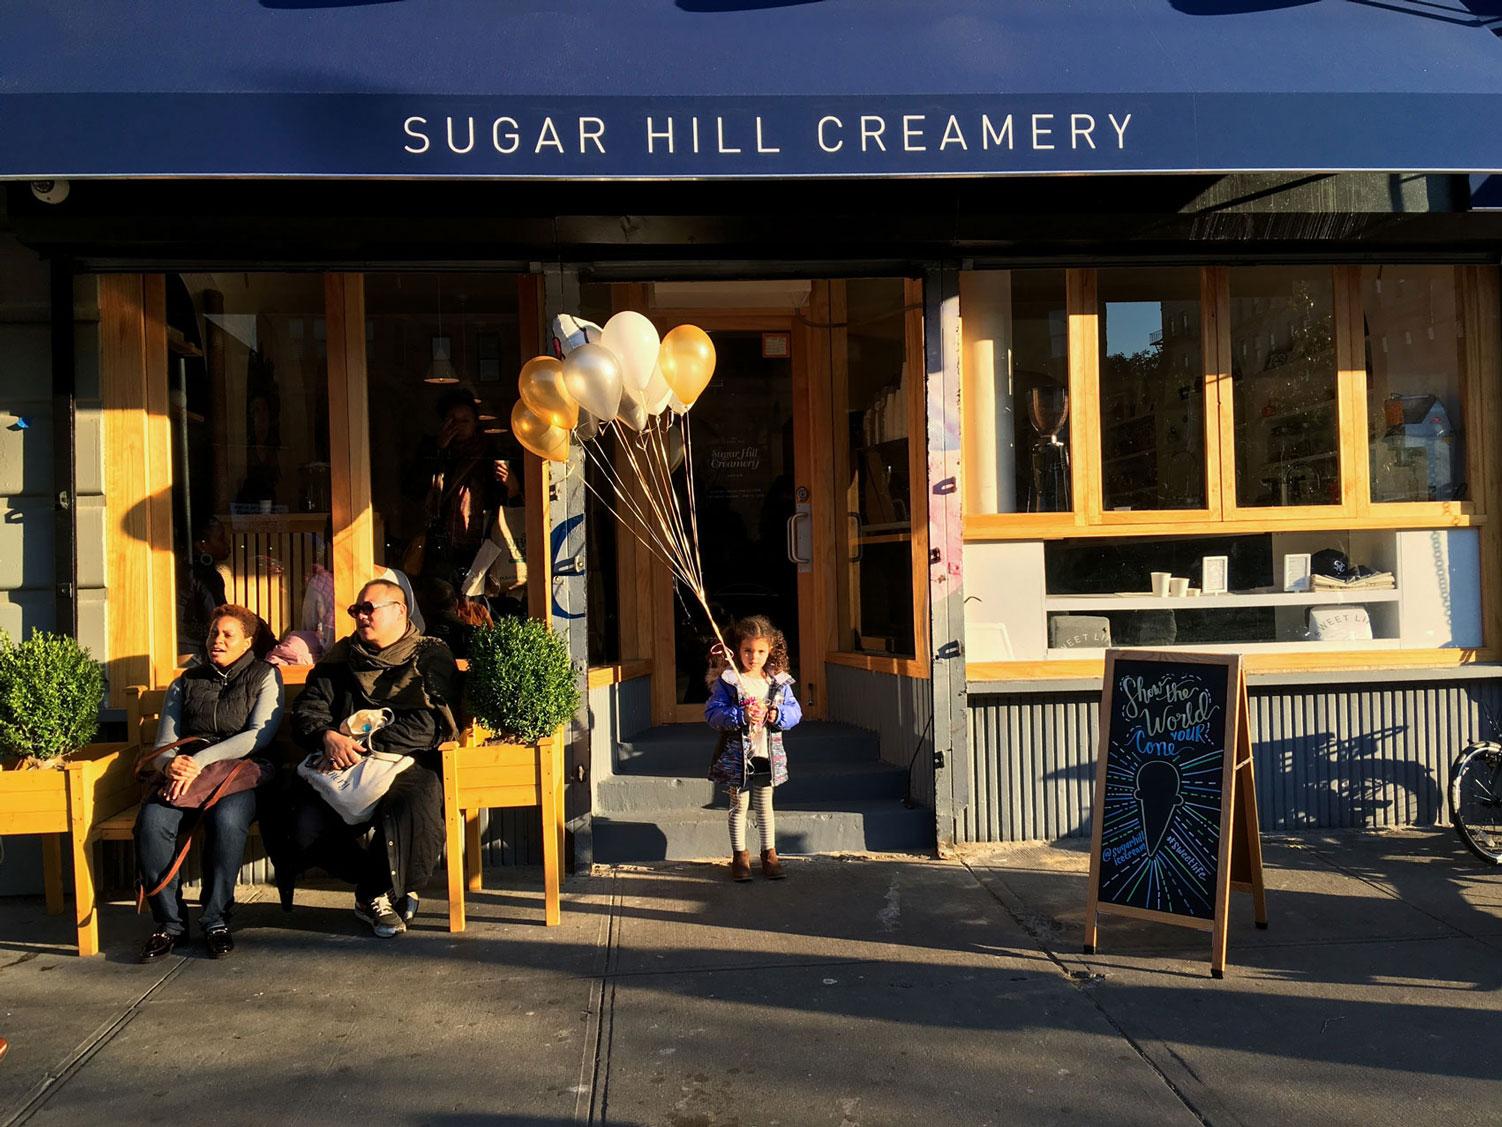 Customers waiting outside of Sugar Hill Creamery.